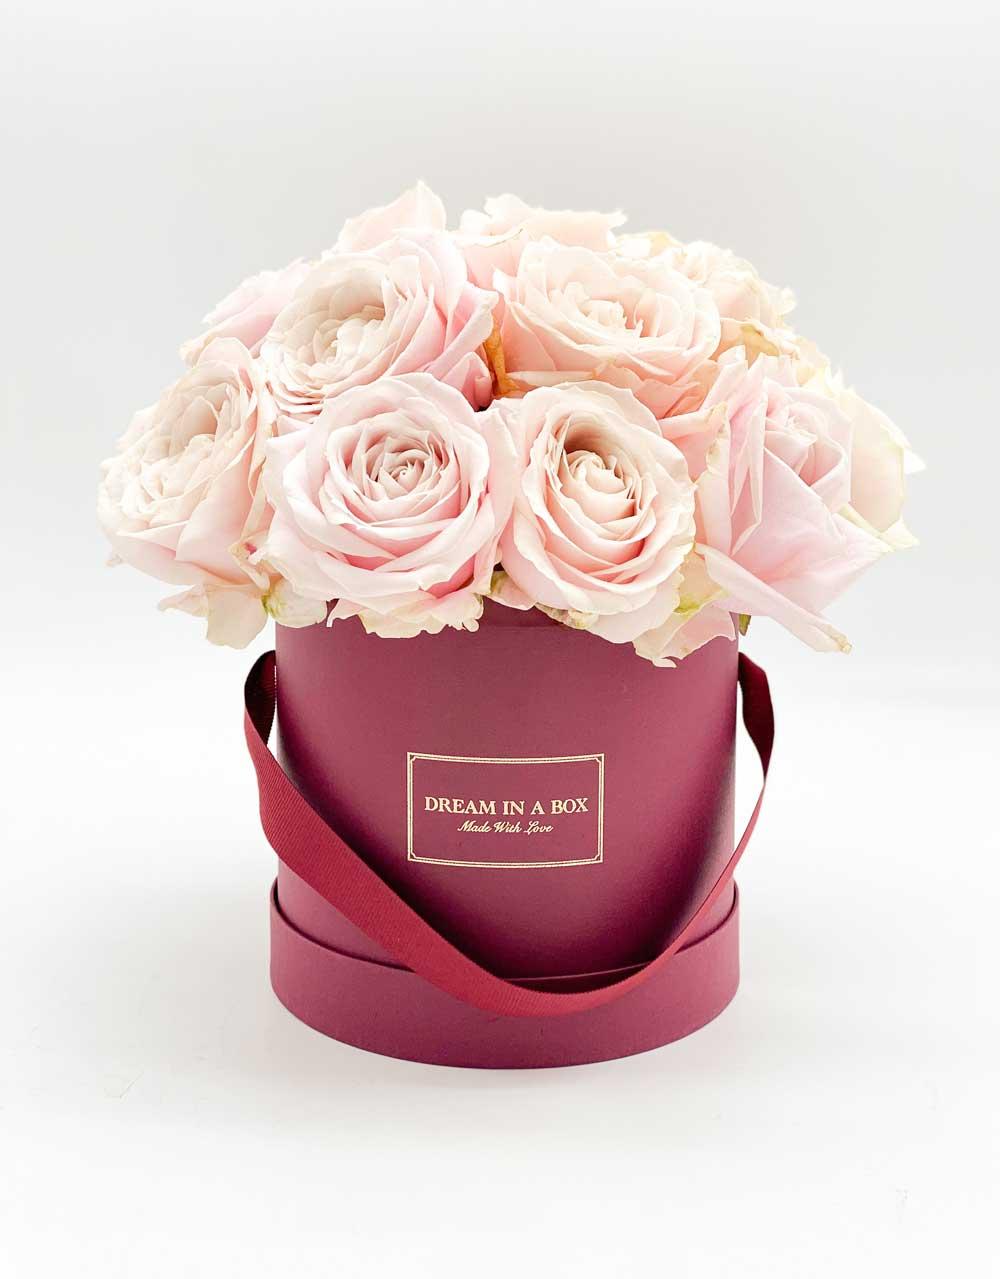 Winter dream Box Bordeaux con rose sweet avalanche